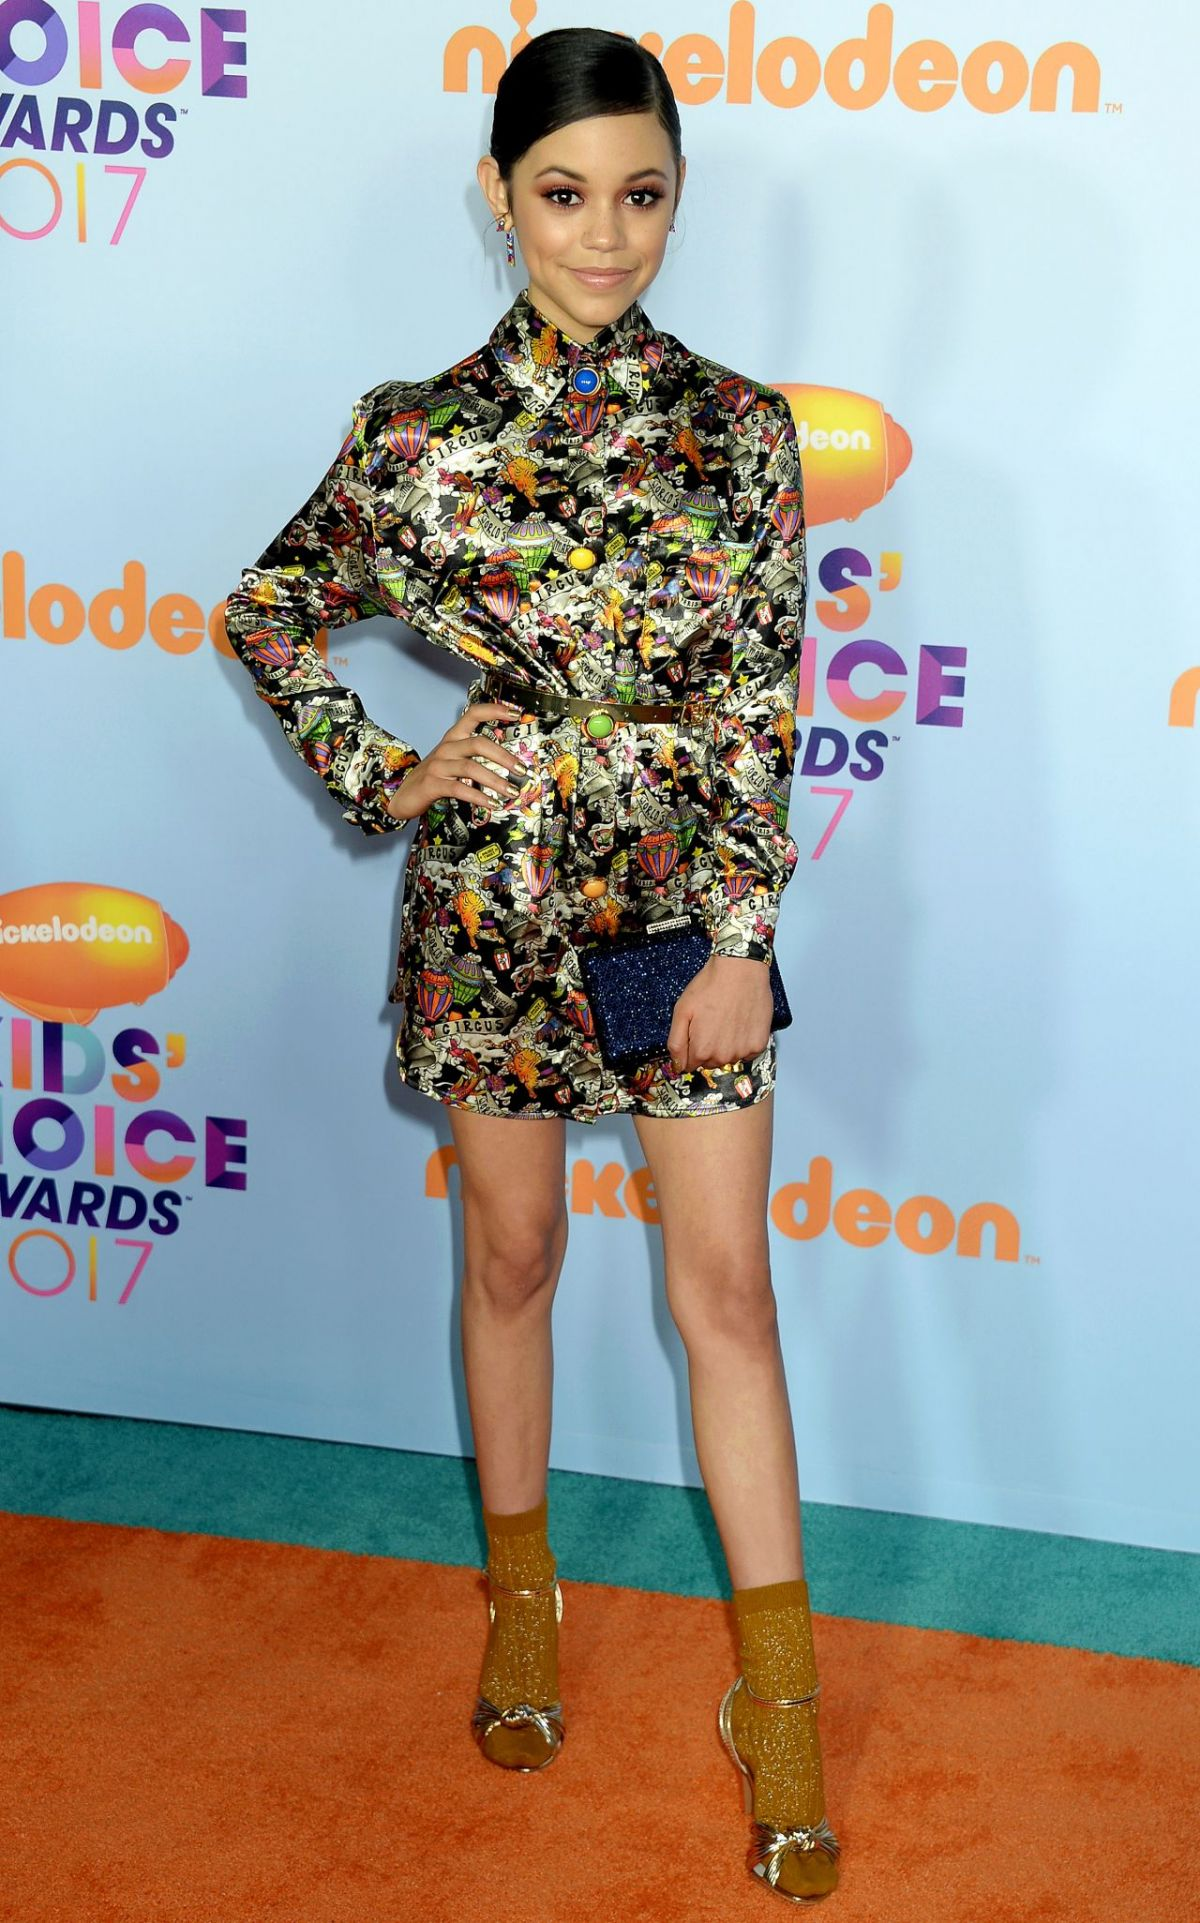 JENNA ORTEGA at Nickelodeon 2017 Kids' Choice Awards in Los Angeles 03/11/2017